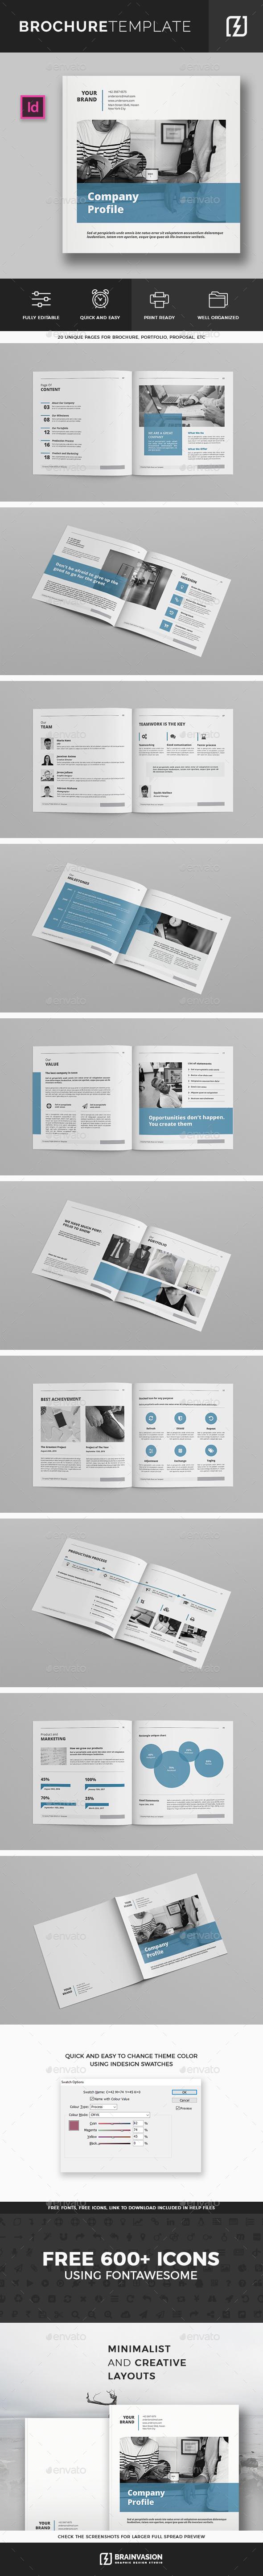 Square Company Profile Brochure Template - Corporate Brochures